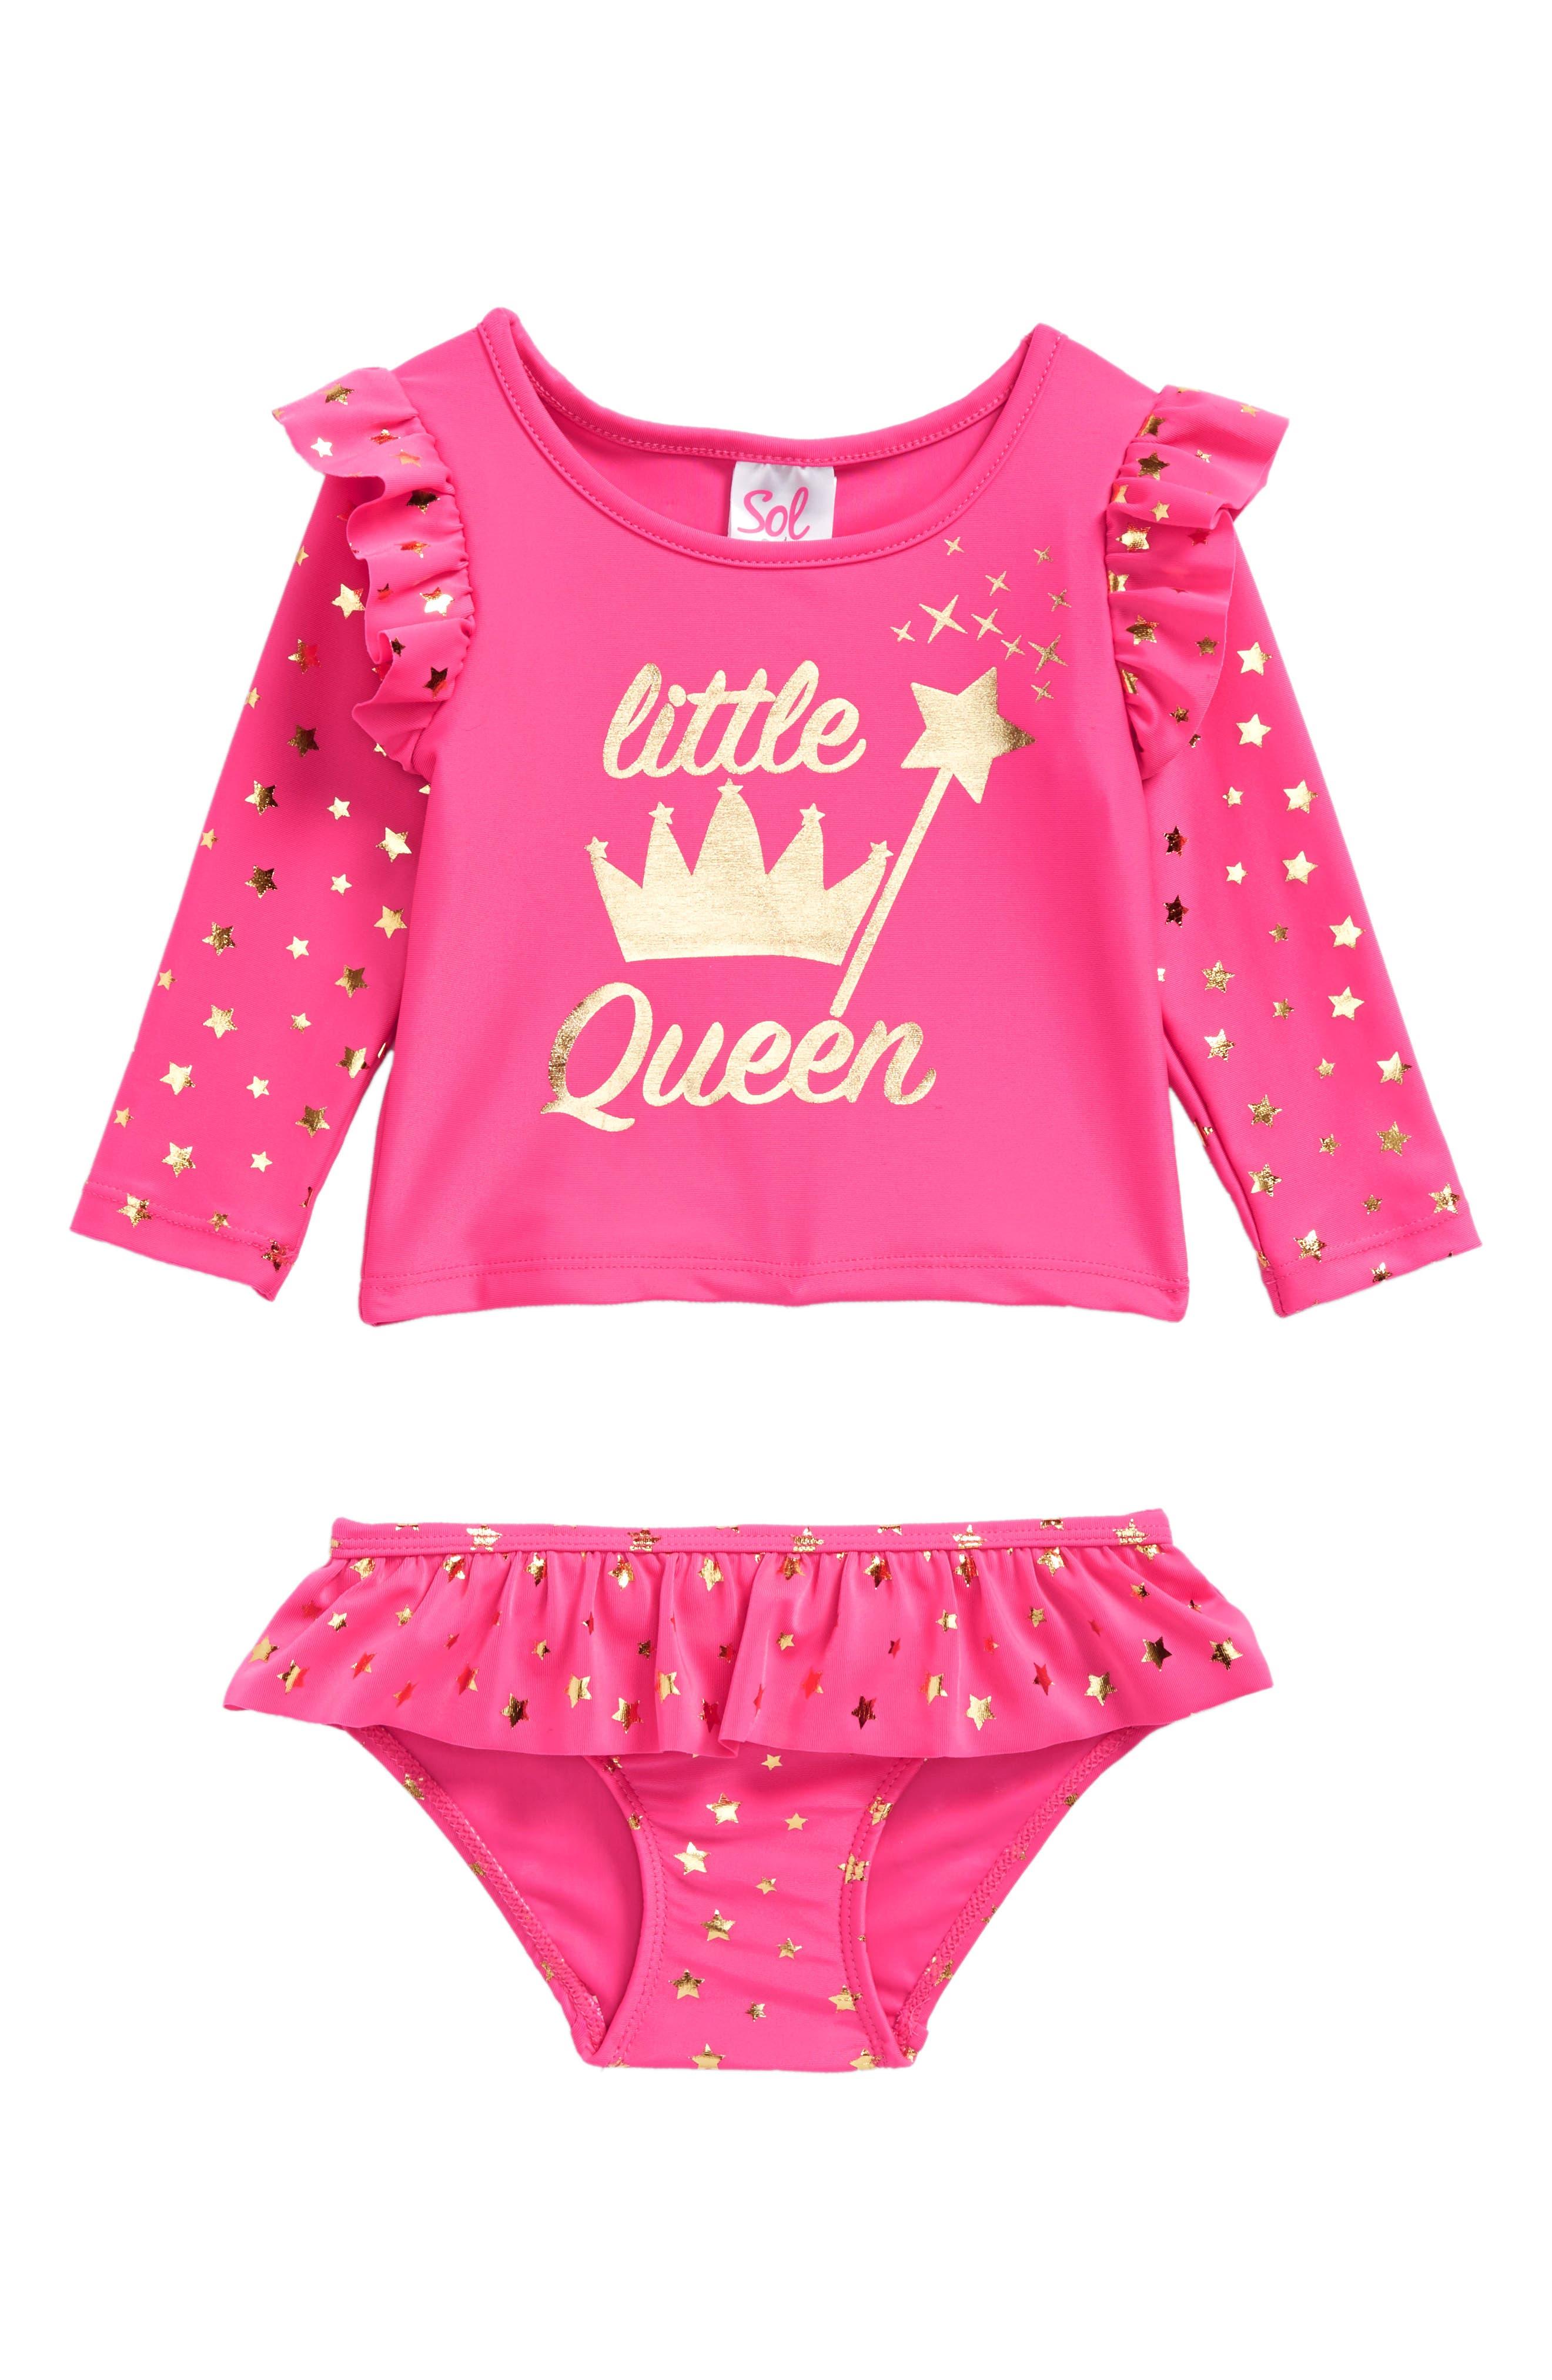 Little Queen Two-Piece Rashguard Swimsuit,                         Main,                         color, Fuchsia